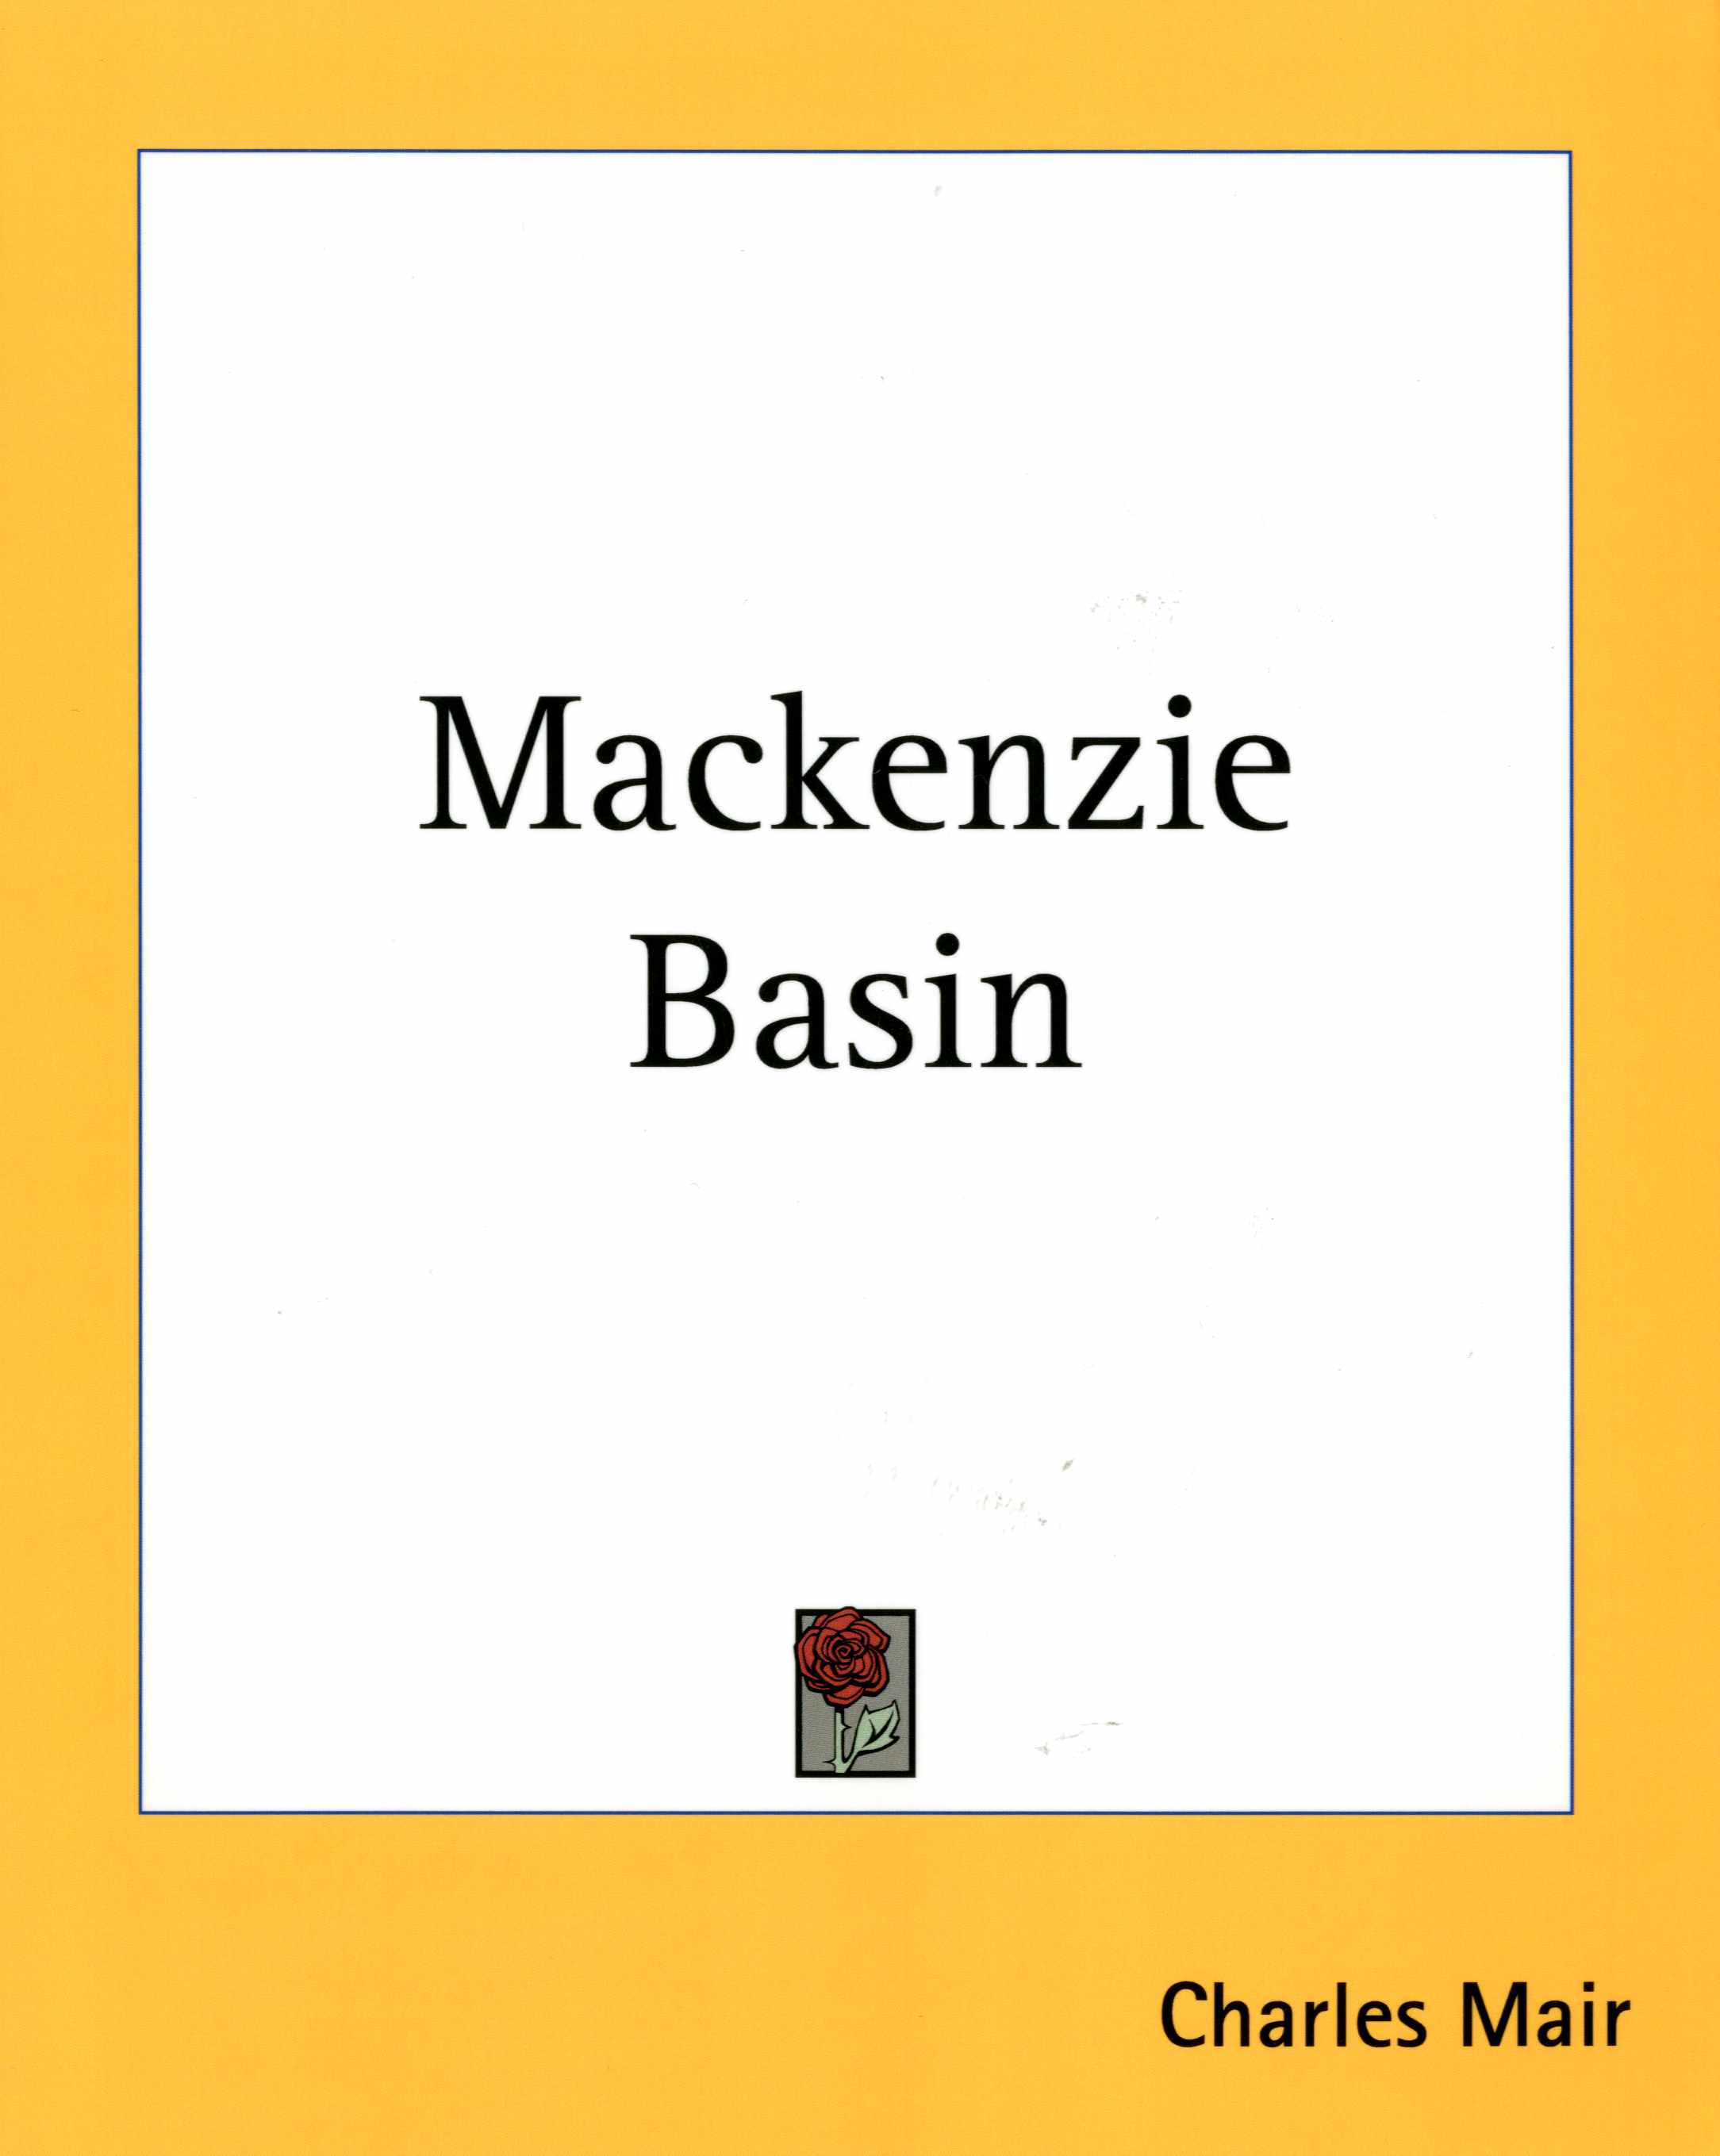 Mackenzie Basin Image